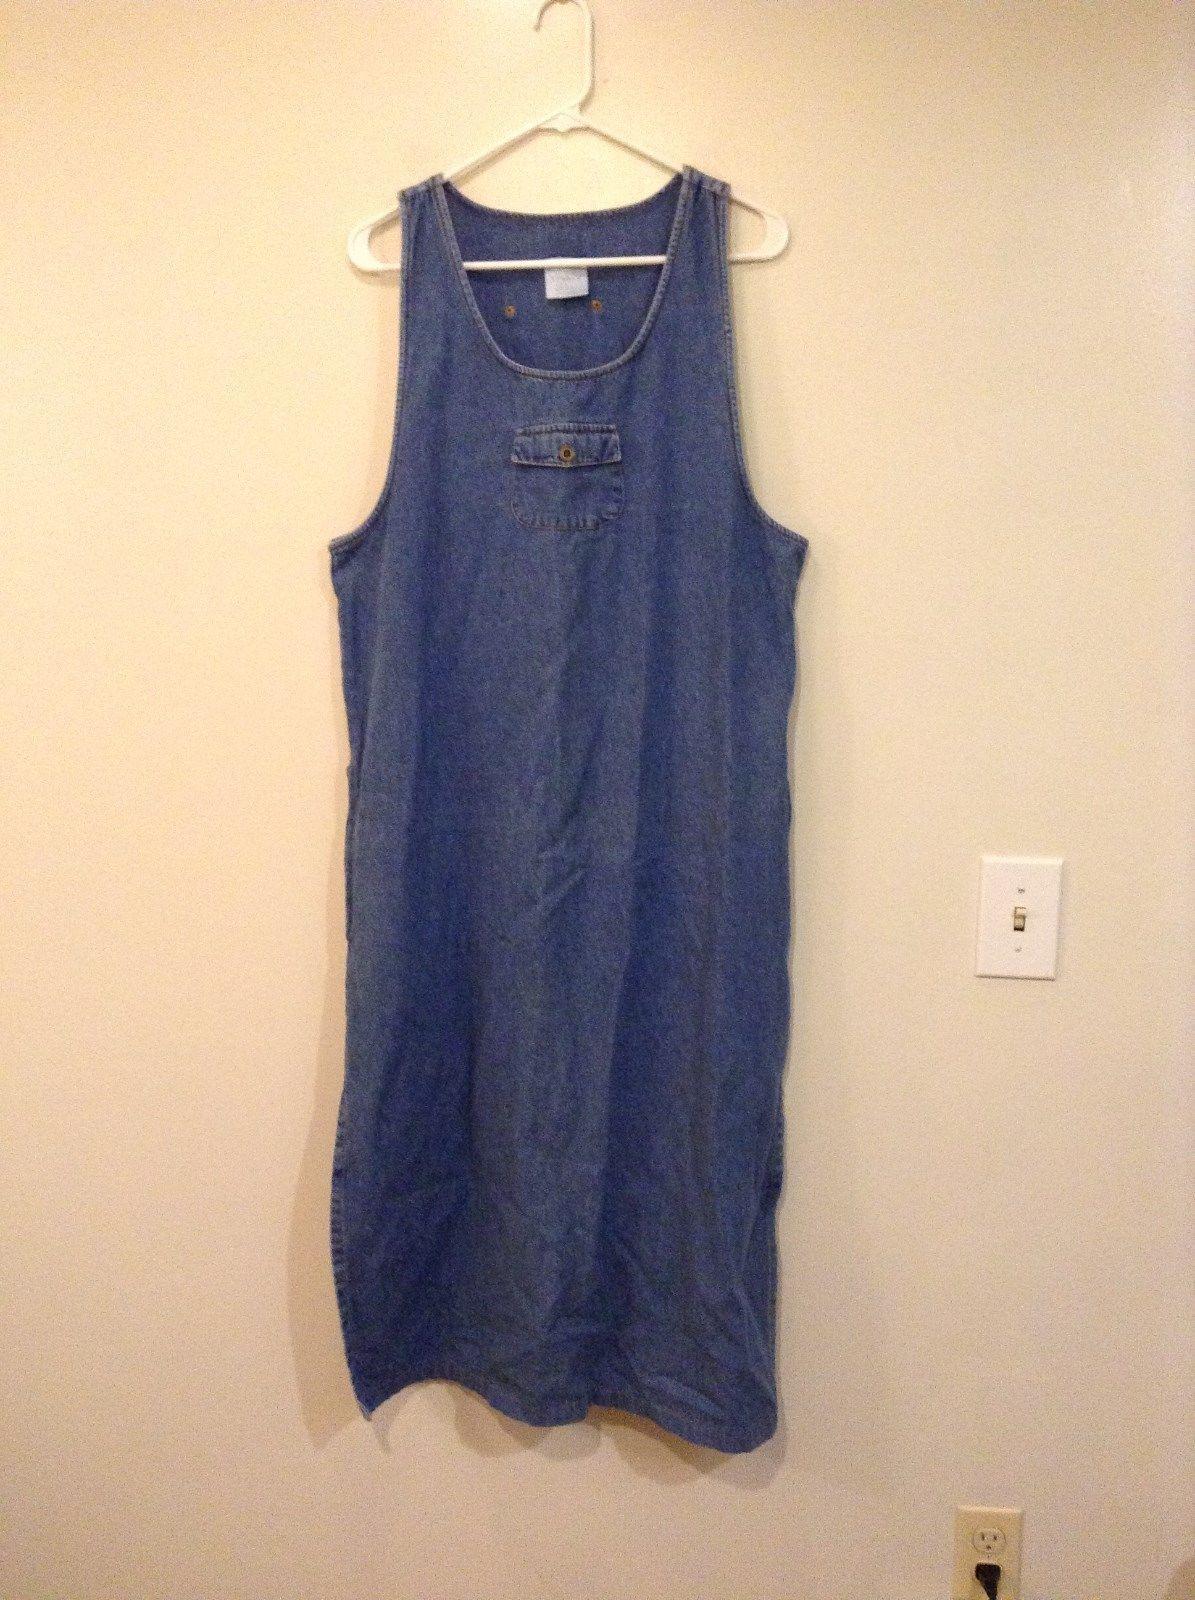 Style Studio Sleeveless Jean Dress Jumper Decorative Pockets Front Back Size L